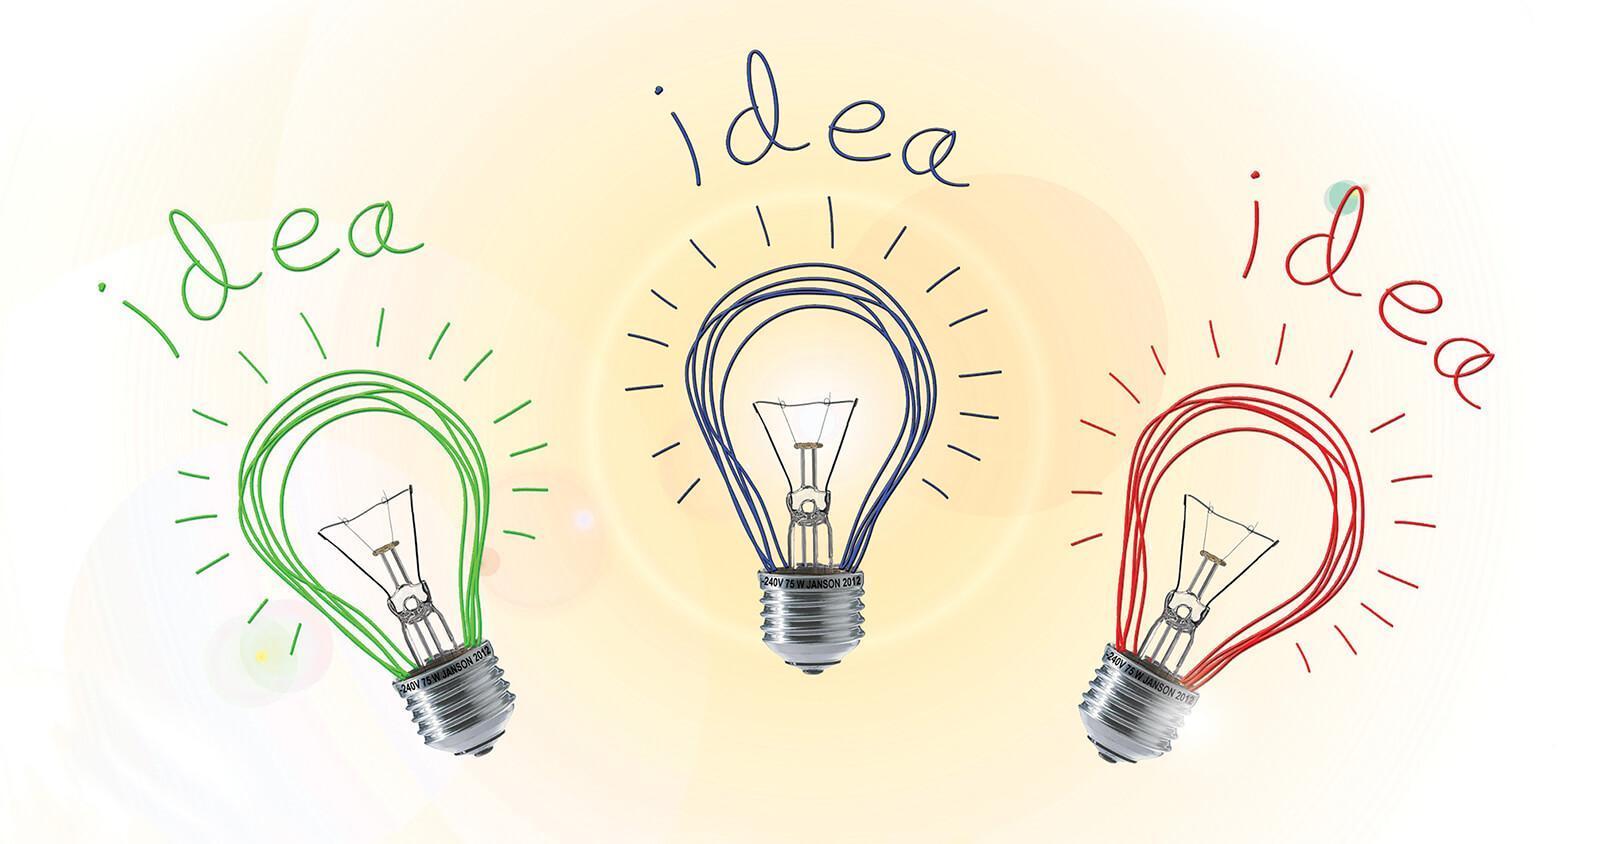 Three ideas to make work better